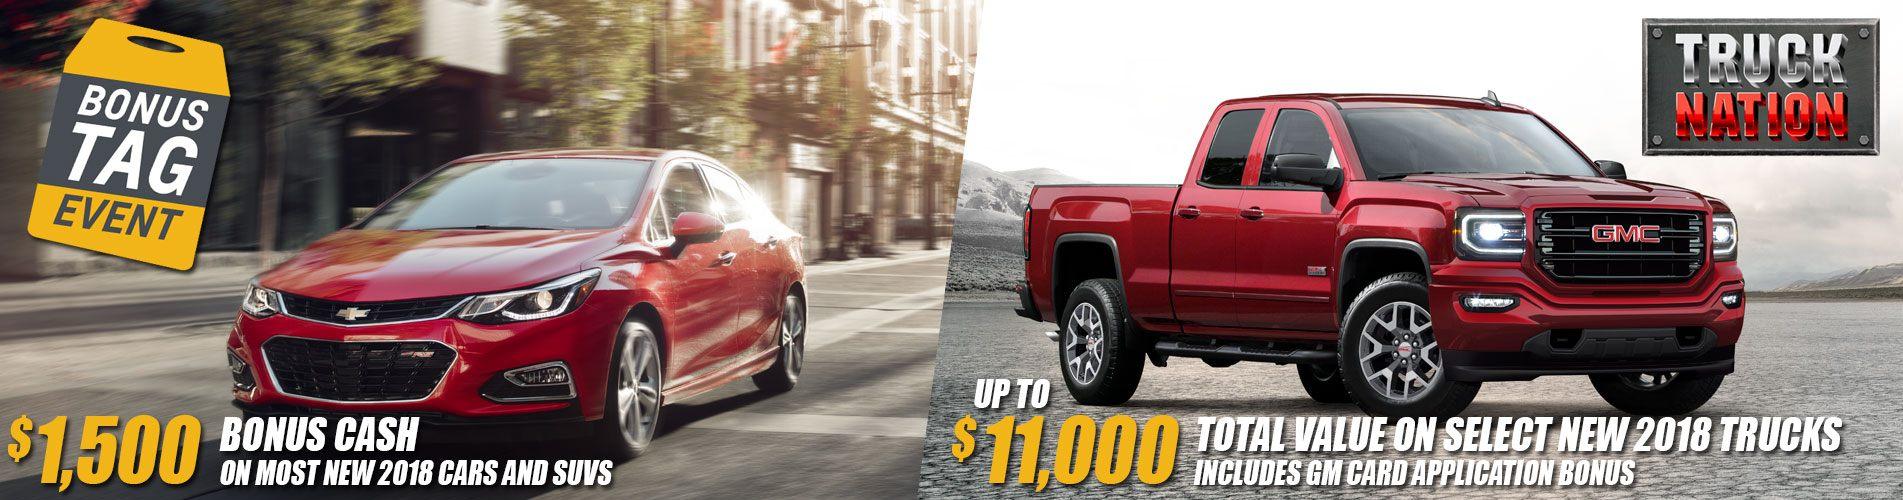 Chevrolet Buick GMC Bonus Tag Event plus Truck Nation Sale on new Chevrolet Buick GMC cars, trucks and SUVs